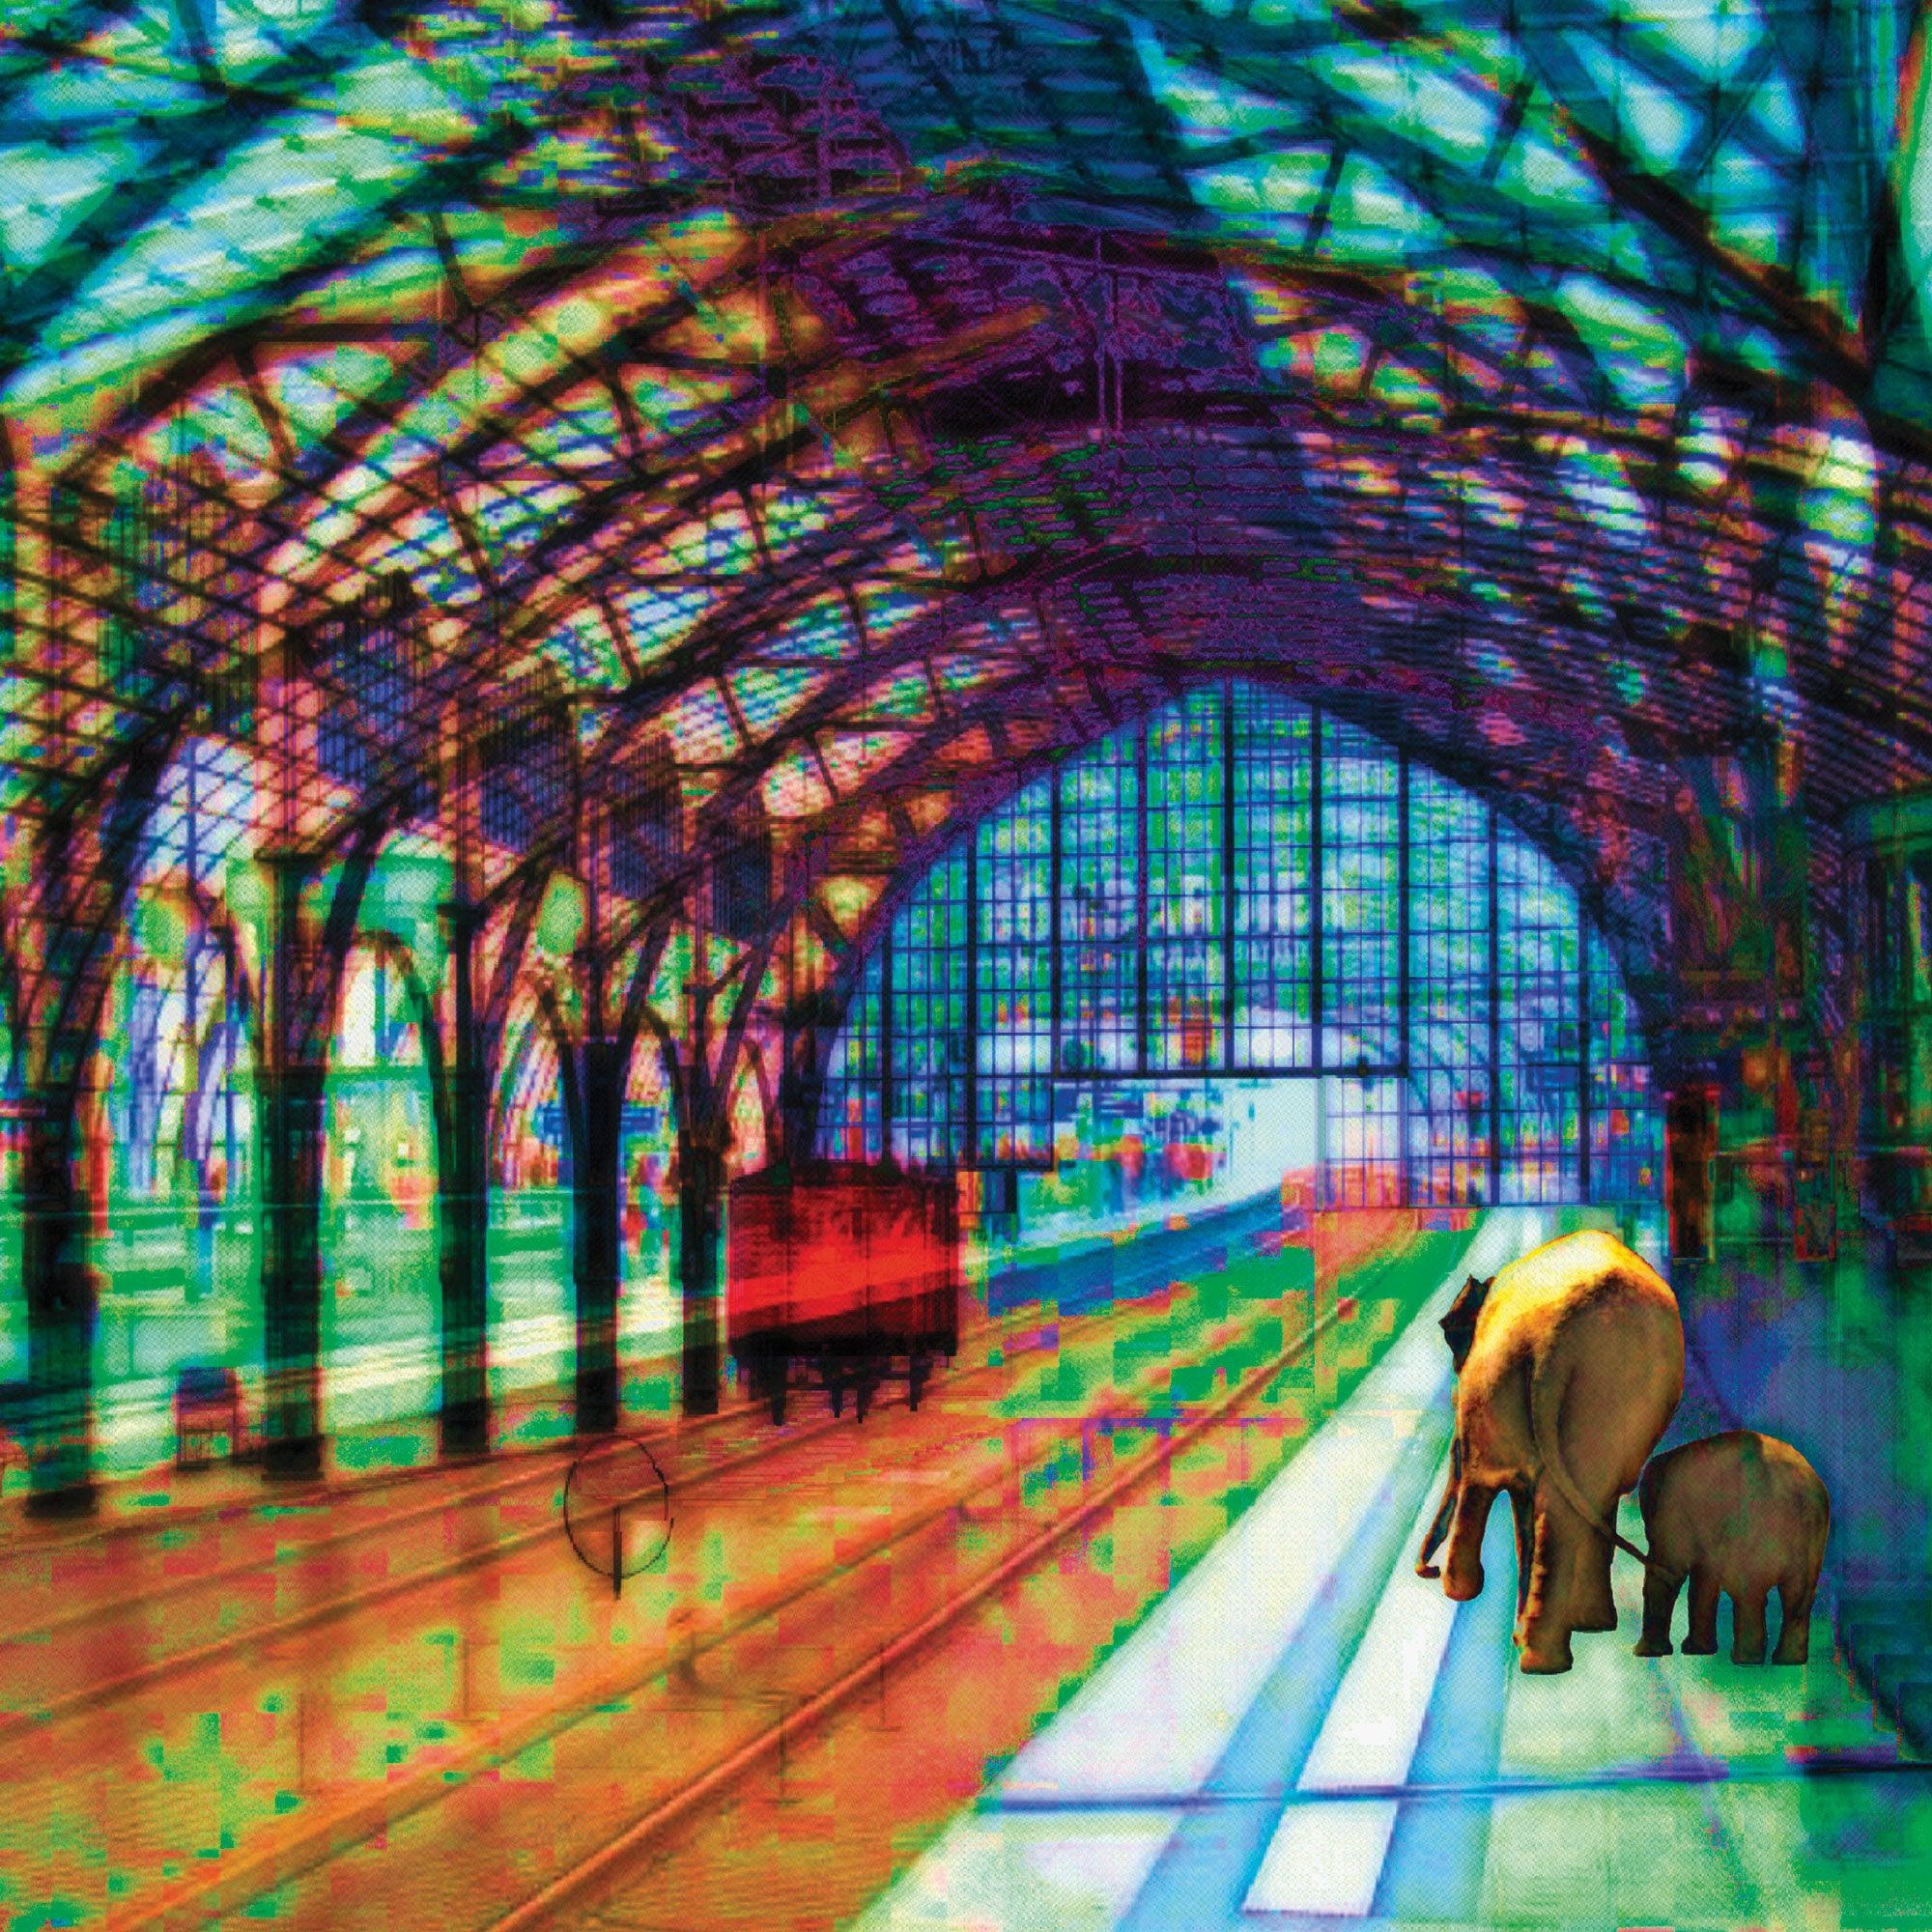 Mojo Mendiola Bild Bahnsteig mit Elefanten  ars mundi